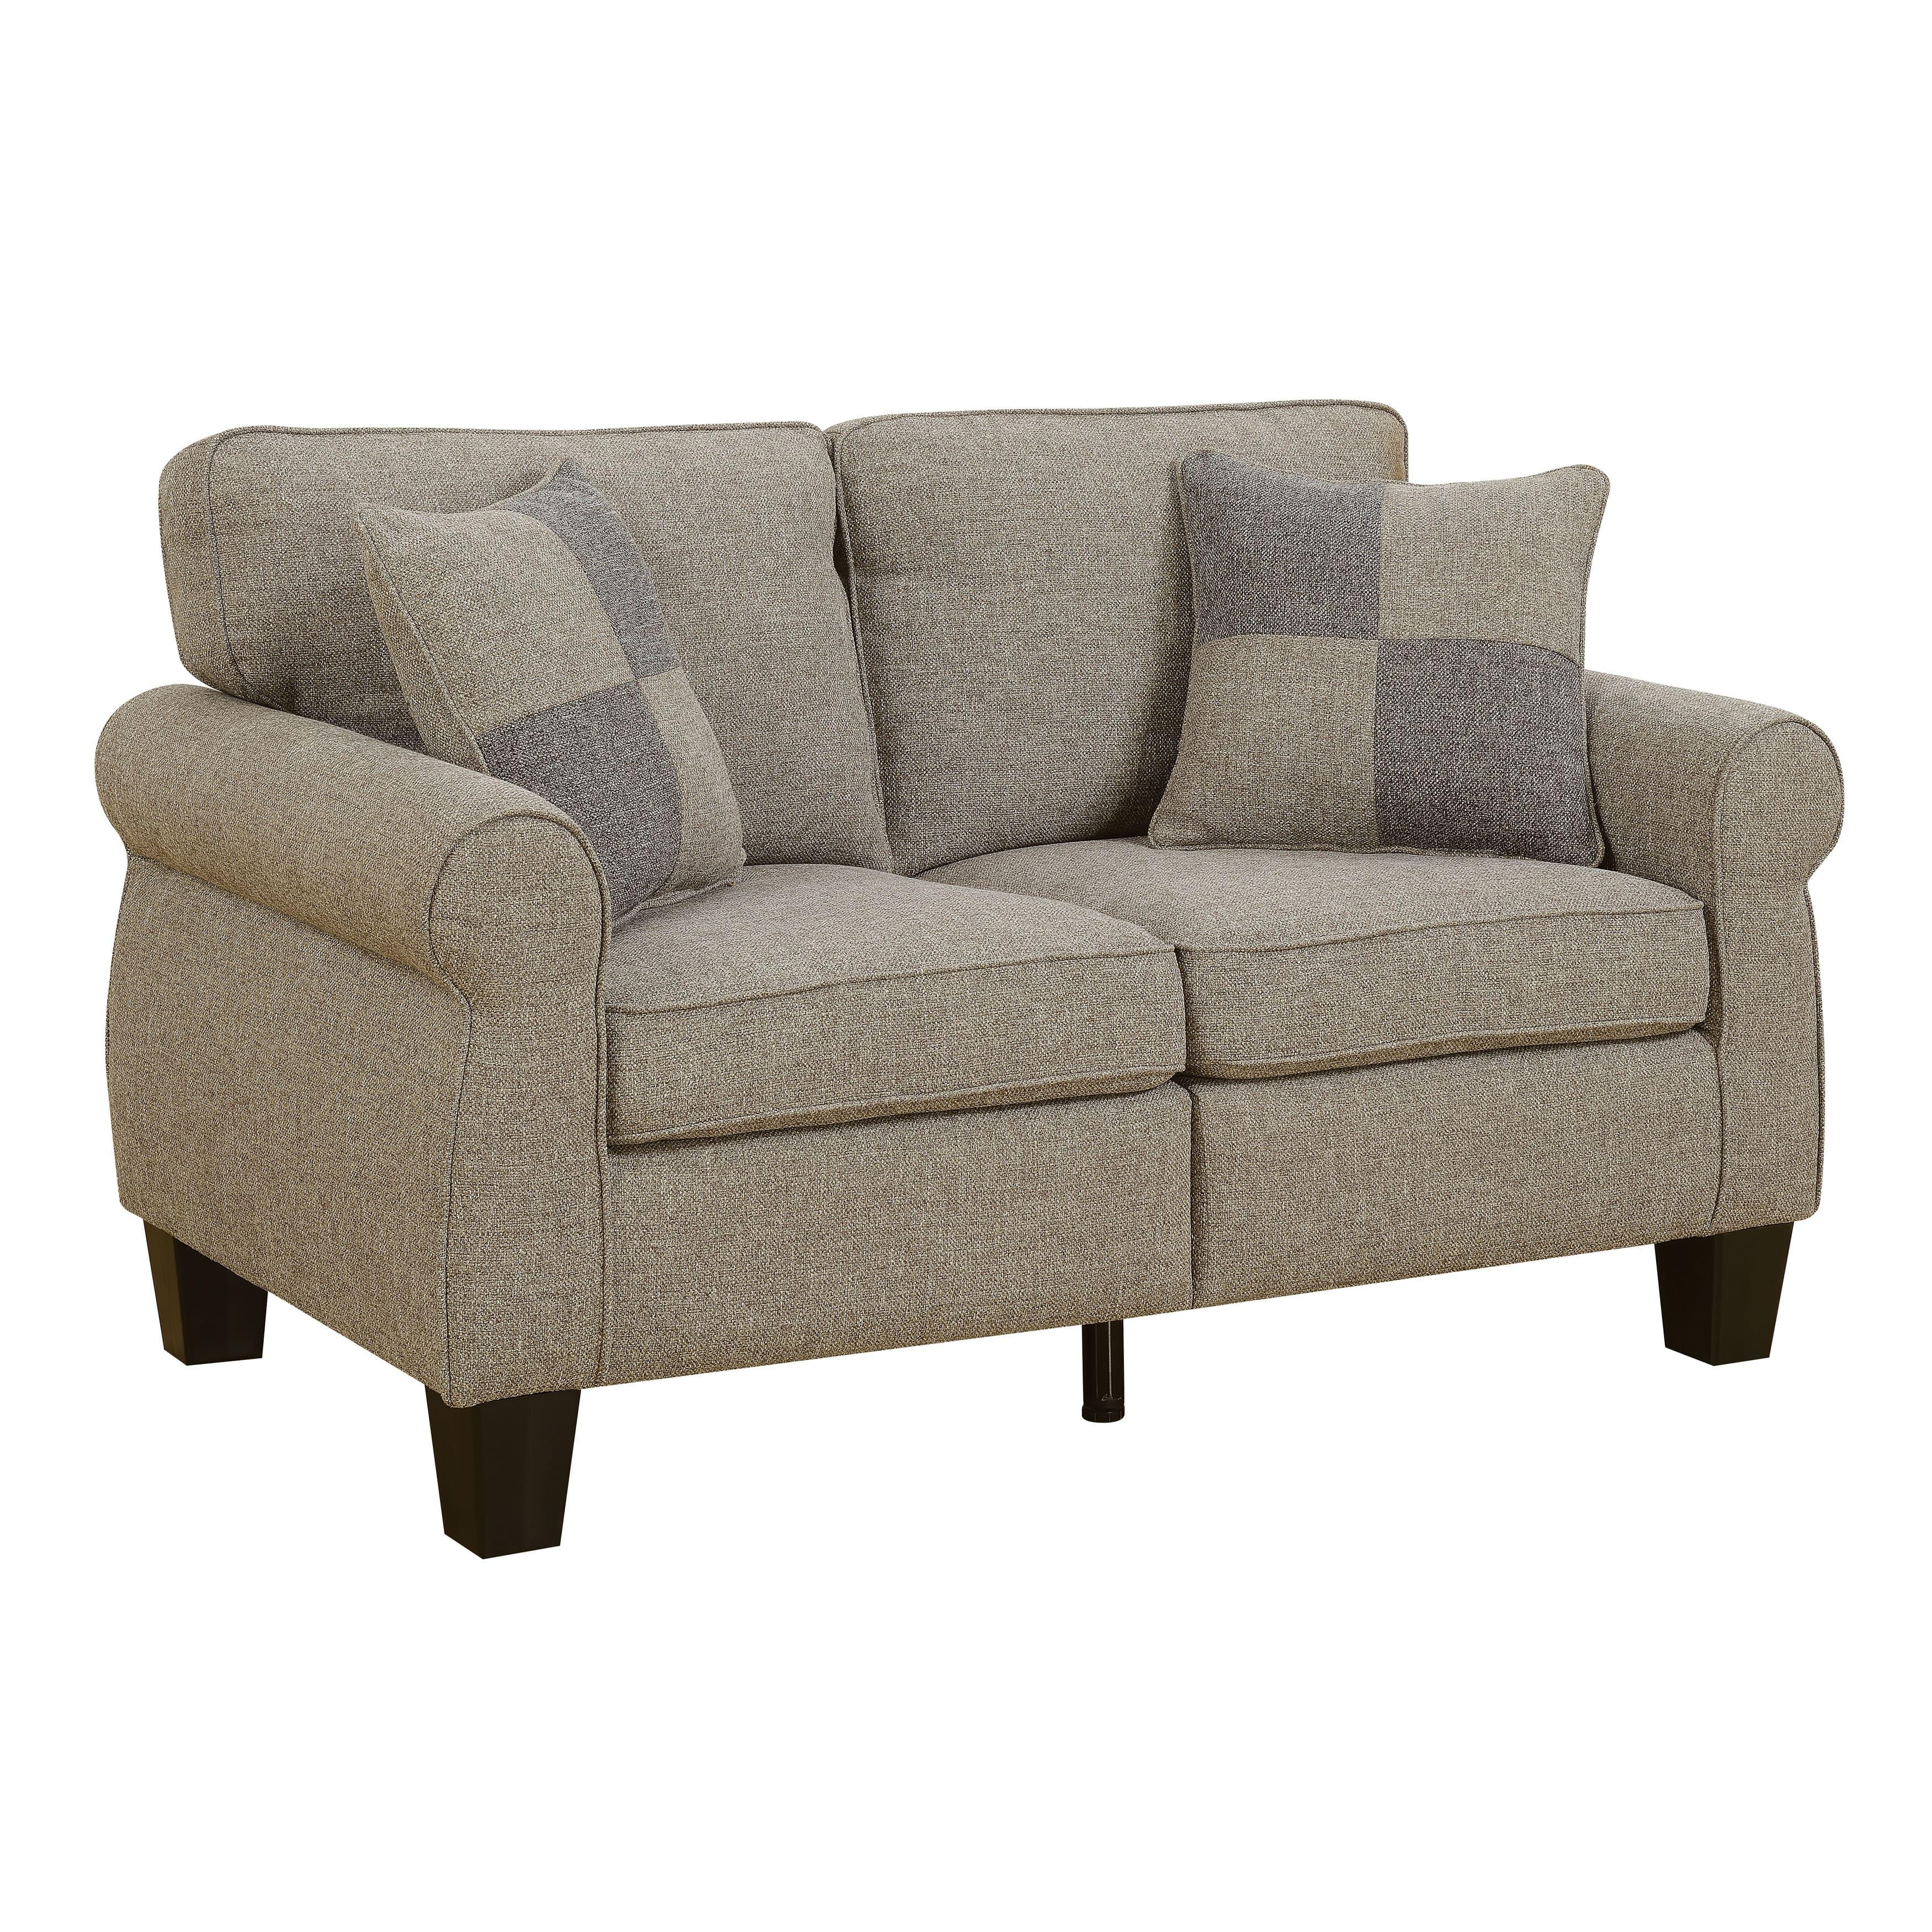 Furniture Of America Herena Transitional Linen Like Loveseat Light Grey